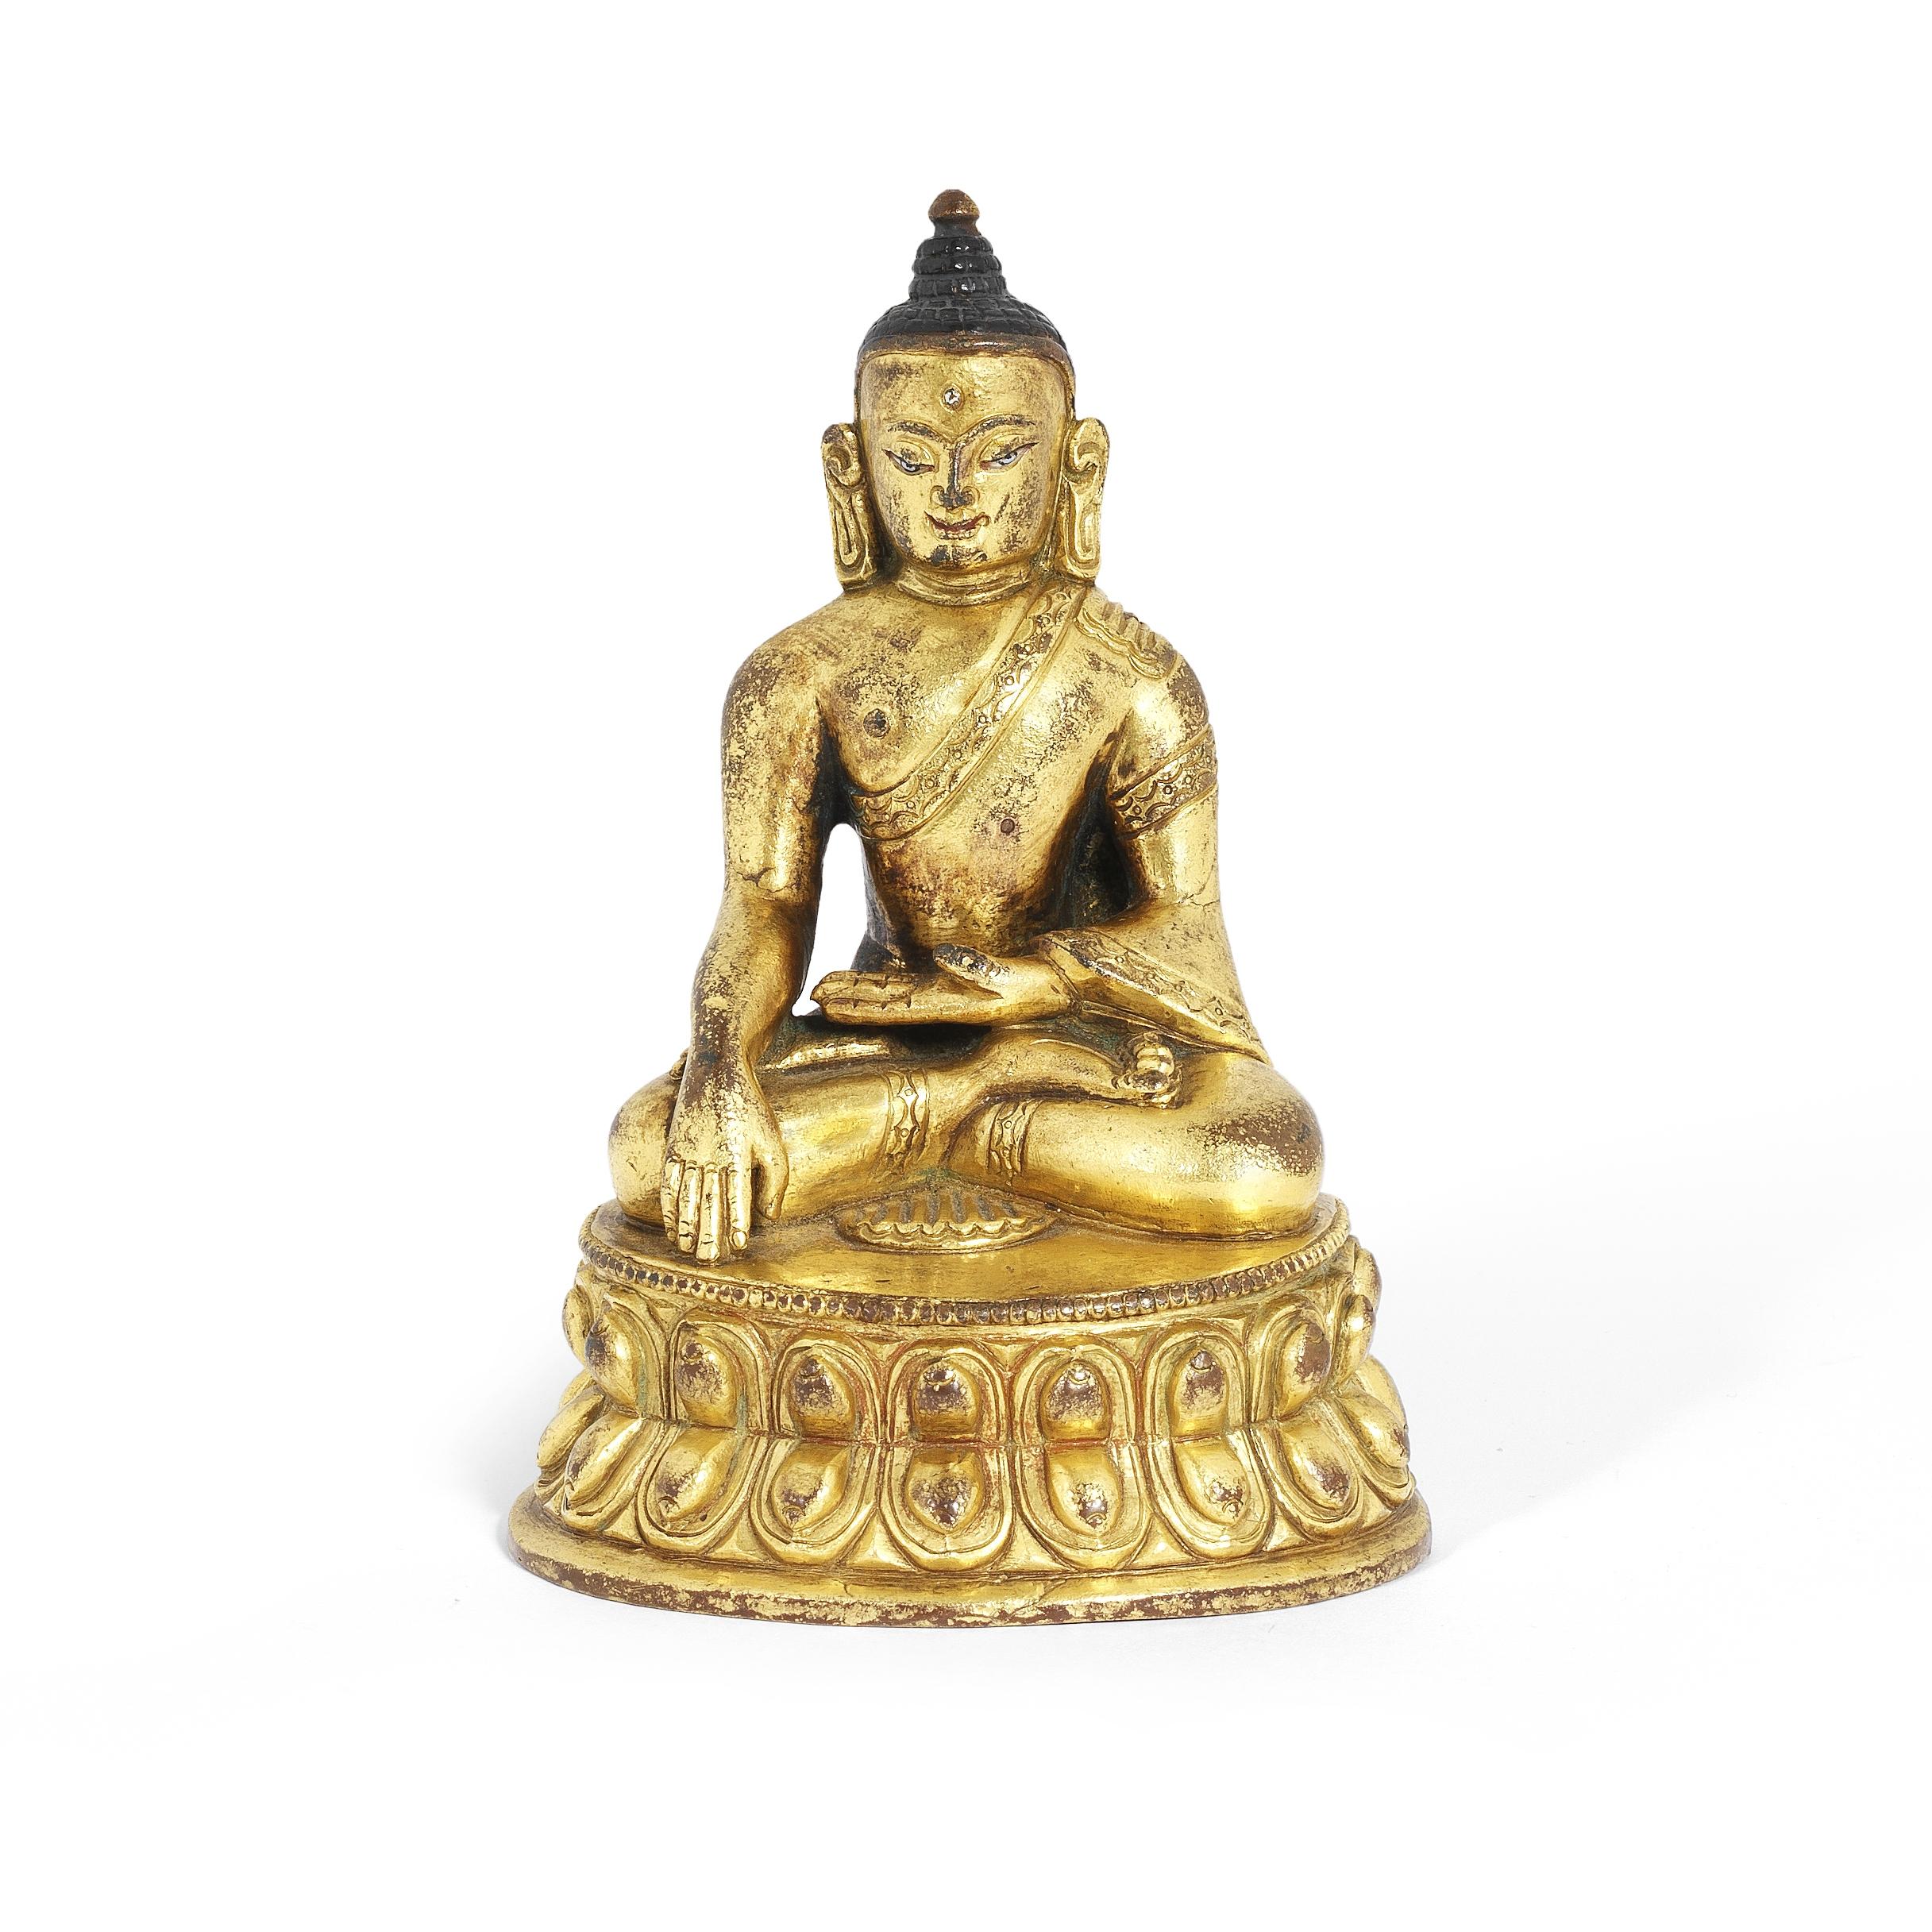 A GILT BRONZE FIGURE OF BUDDHA SHAKYAMUNI 17th/18th century